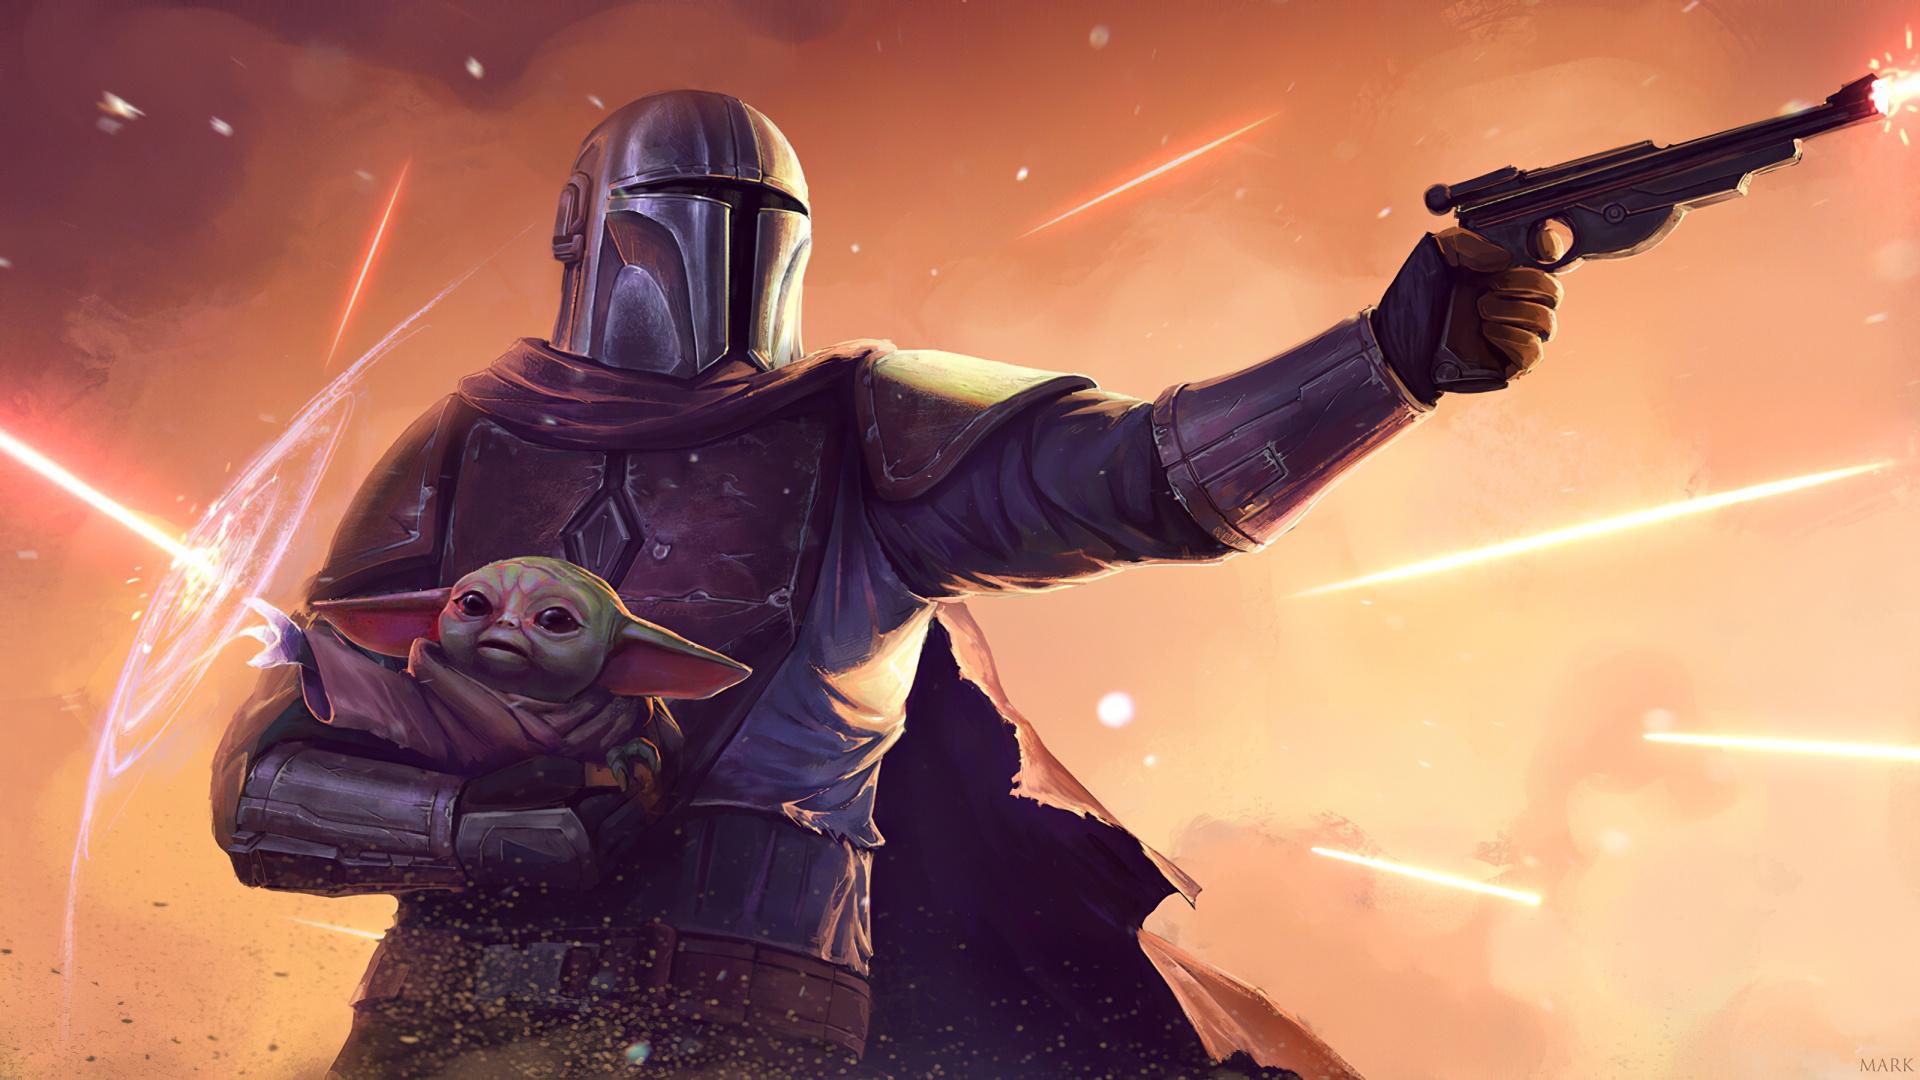 Star Wars laptop wallpaper